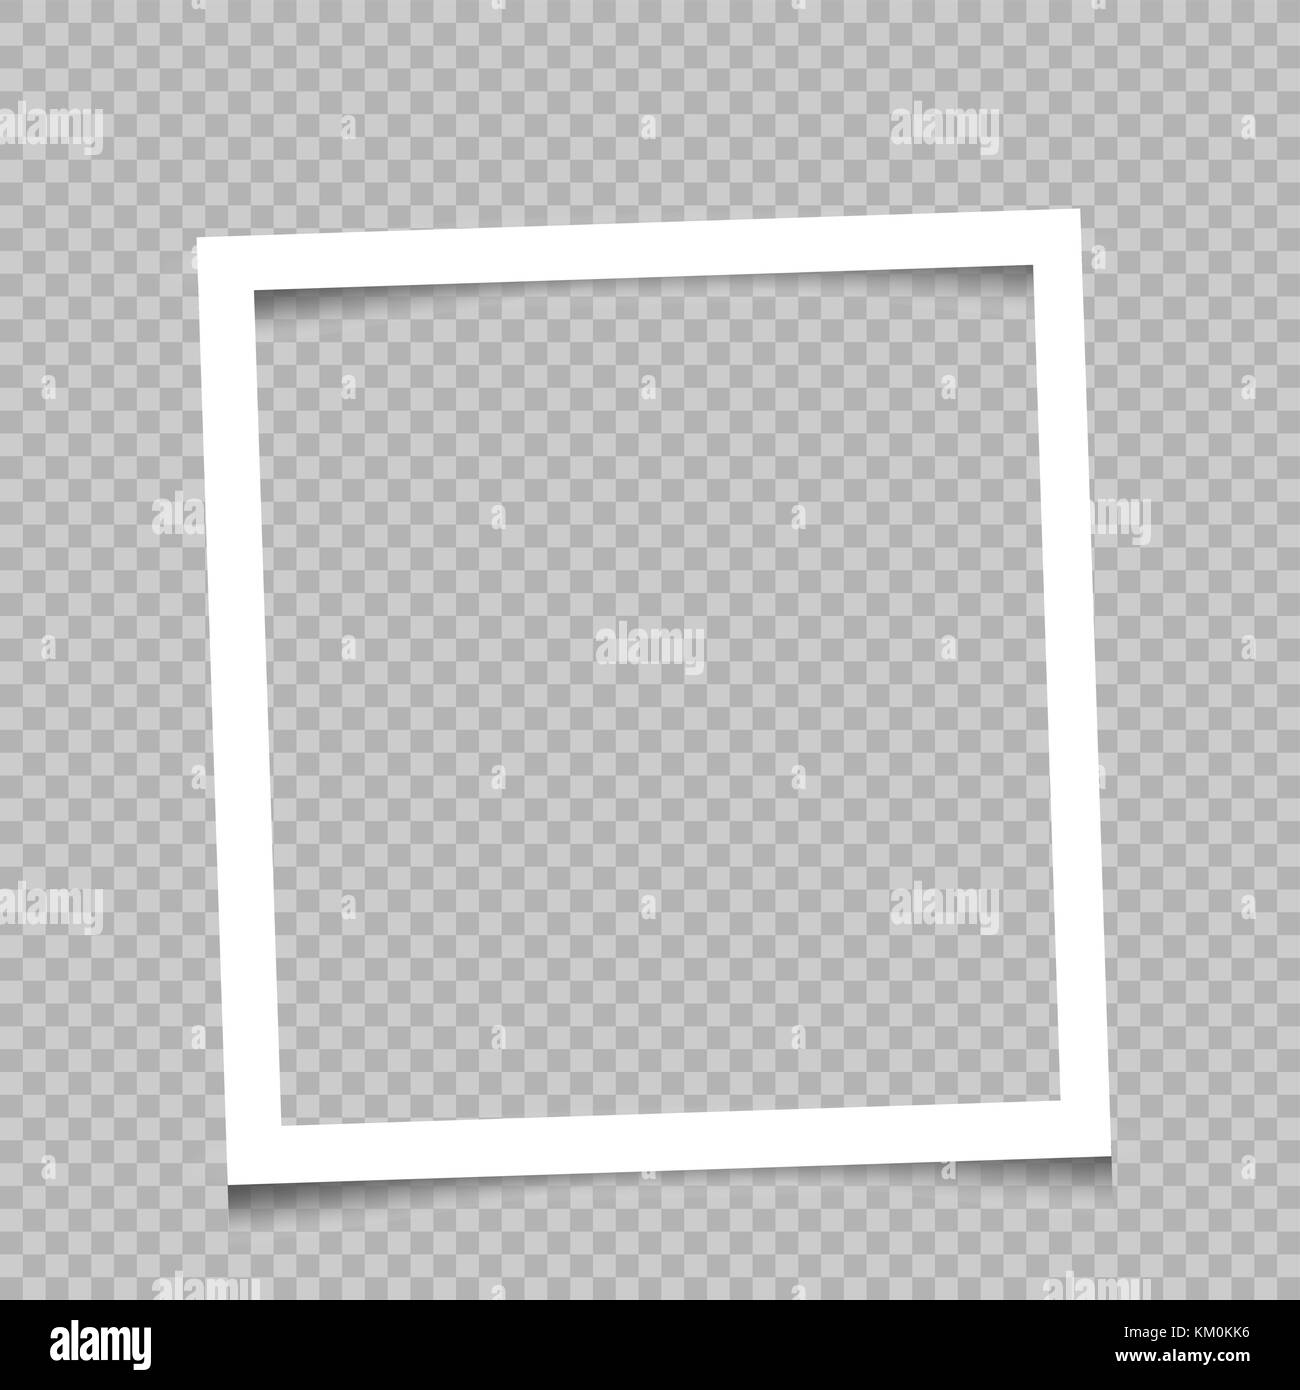 Square frame transparent background Stock Vector Art & Illustration ...